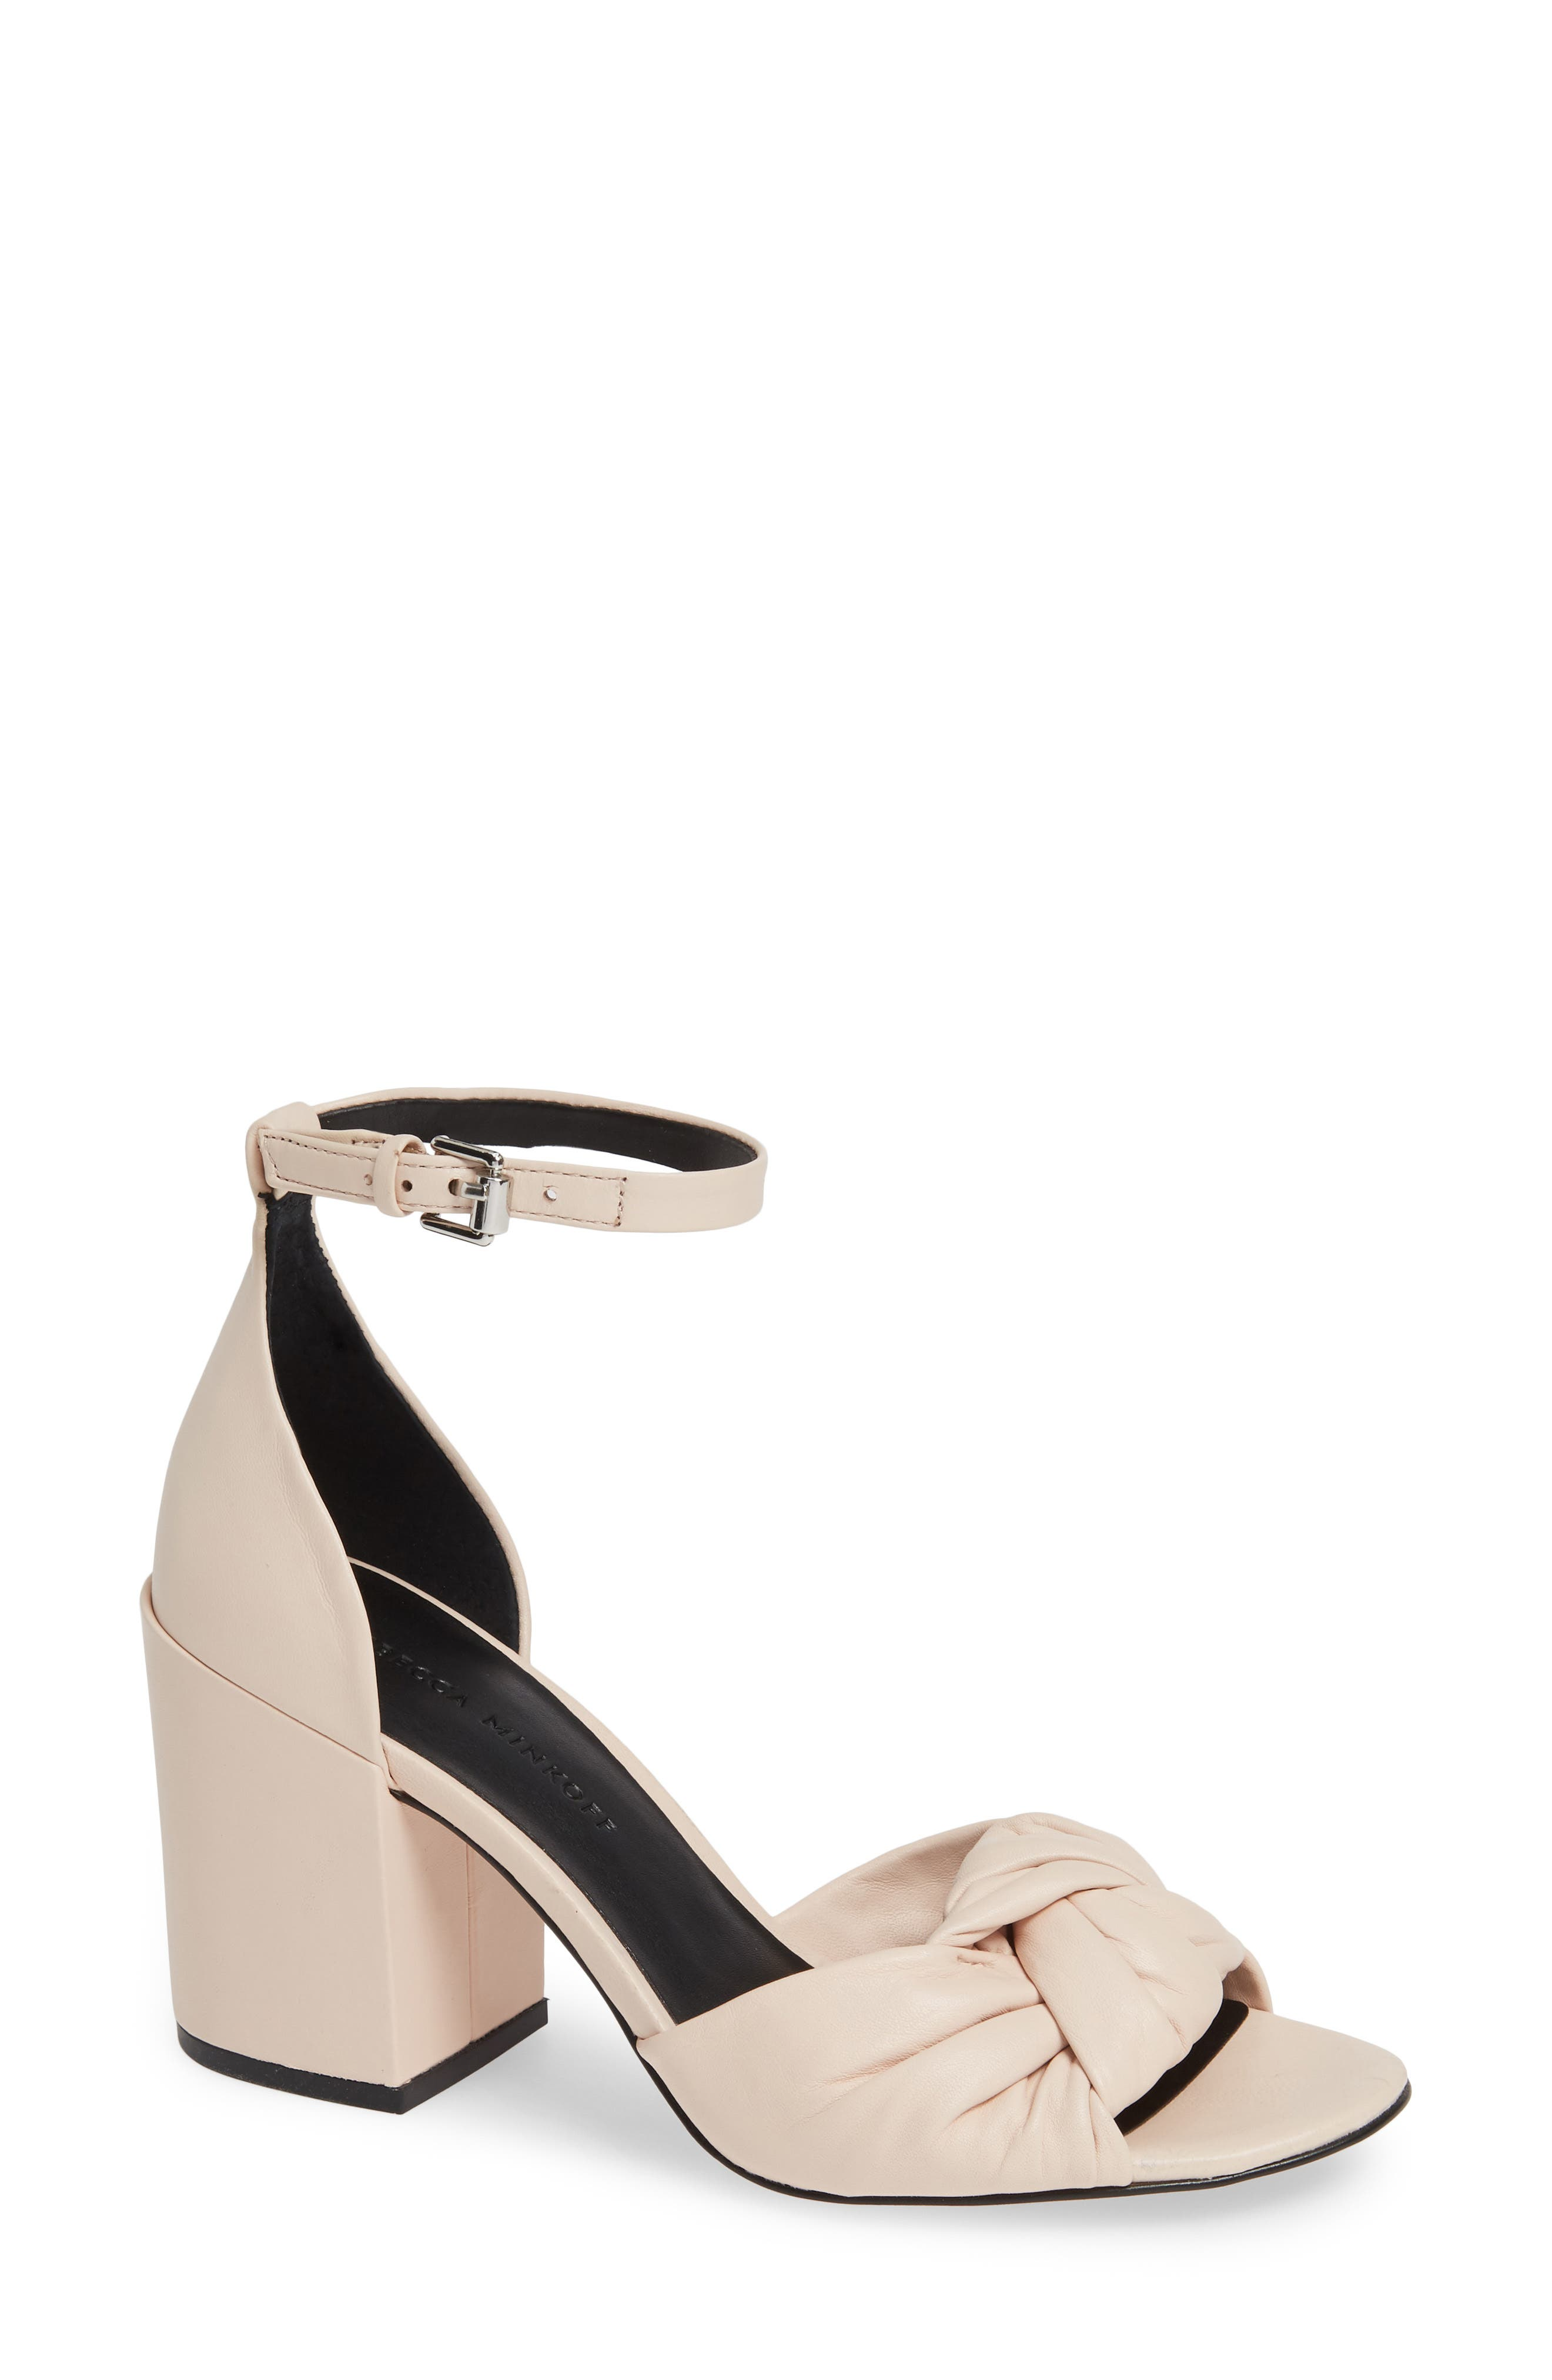 Rebecca Minkoff Capriana Ankle Strap Sandal- Ivory